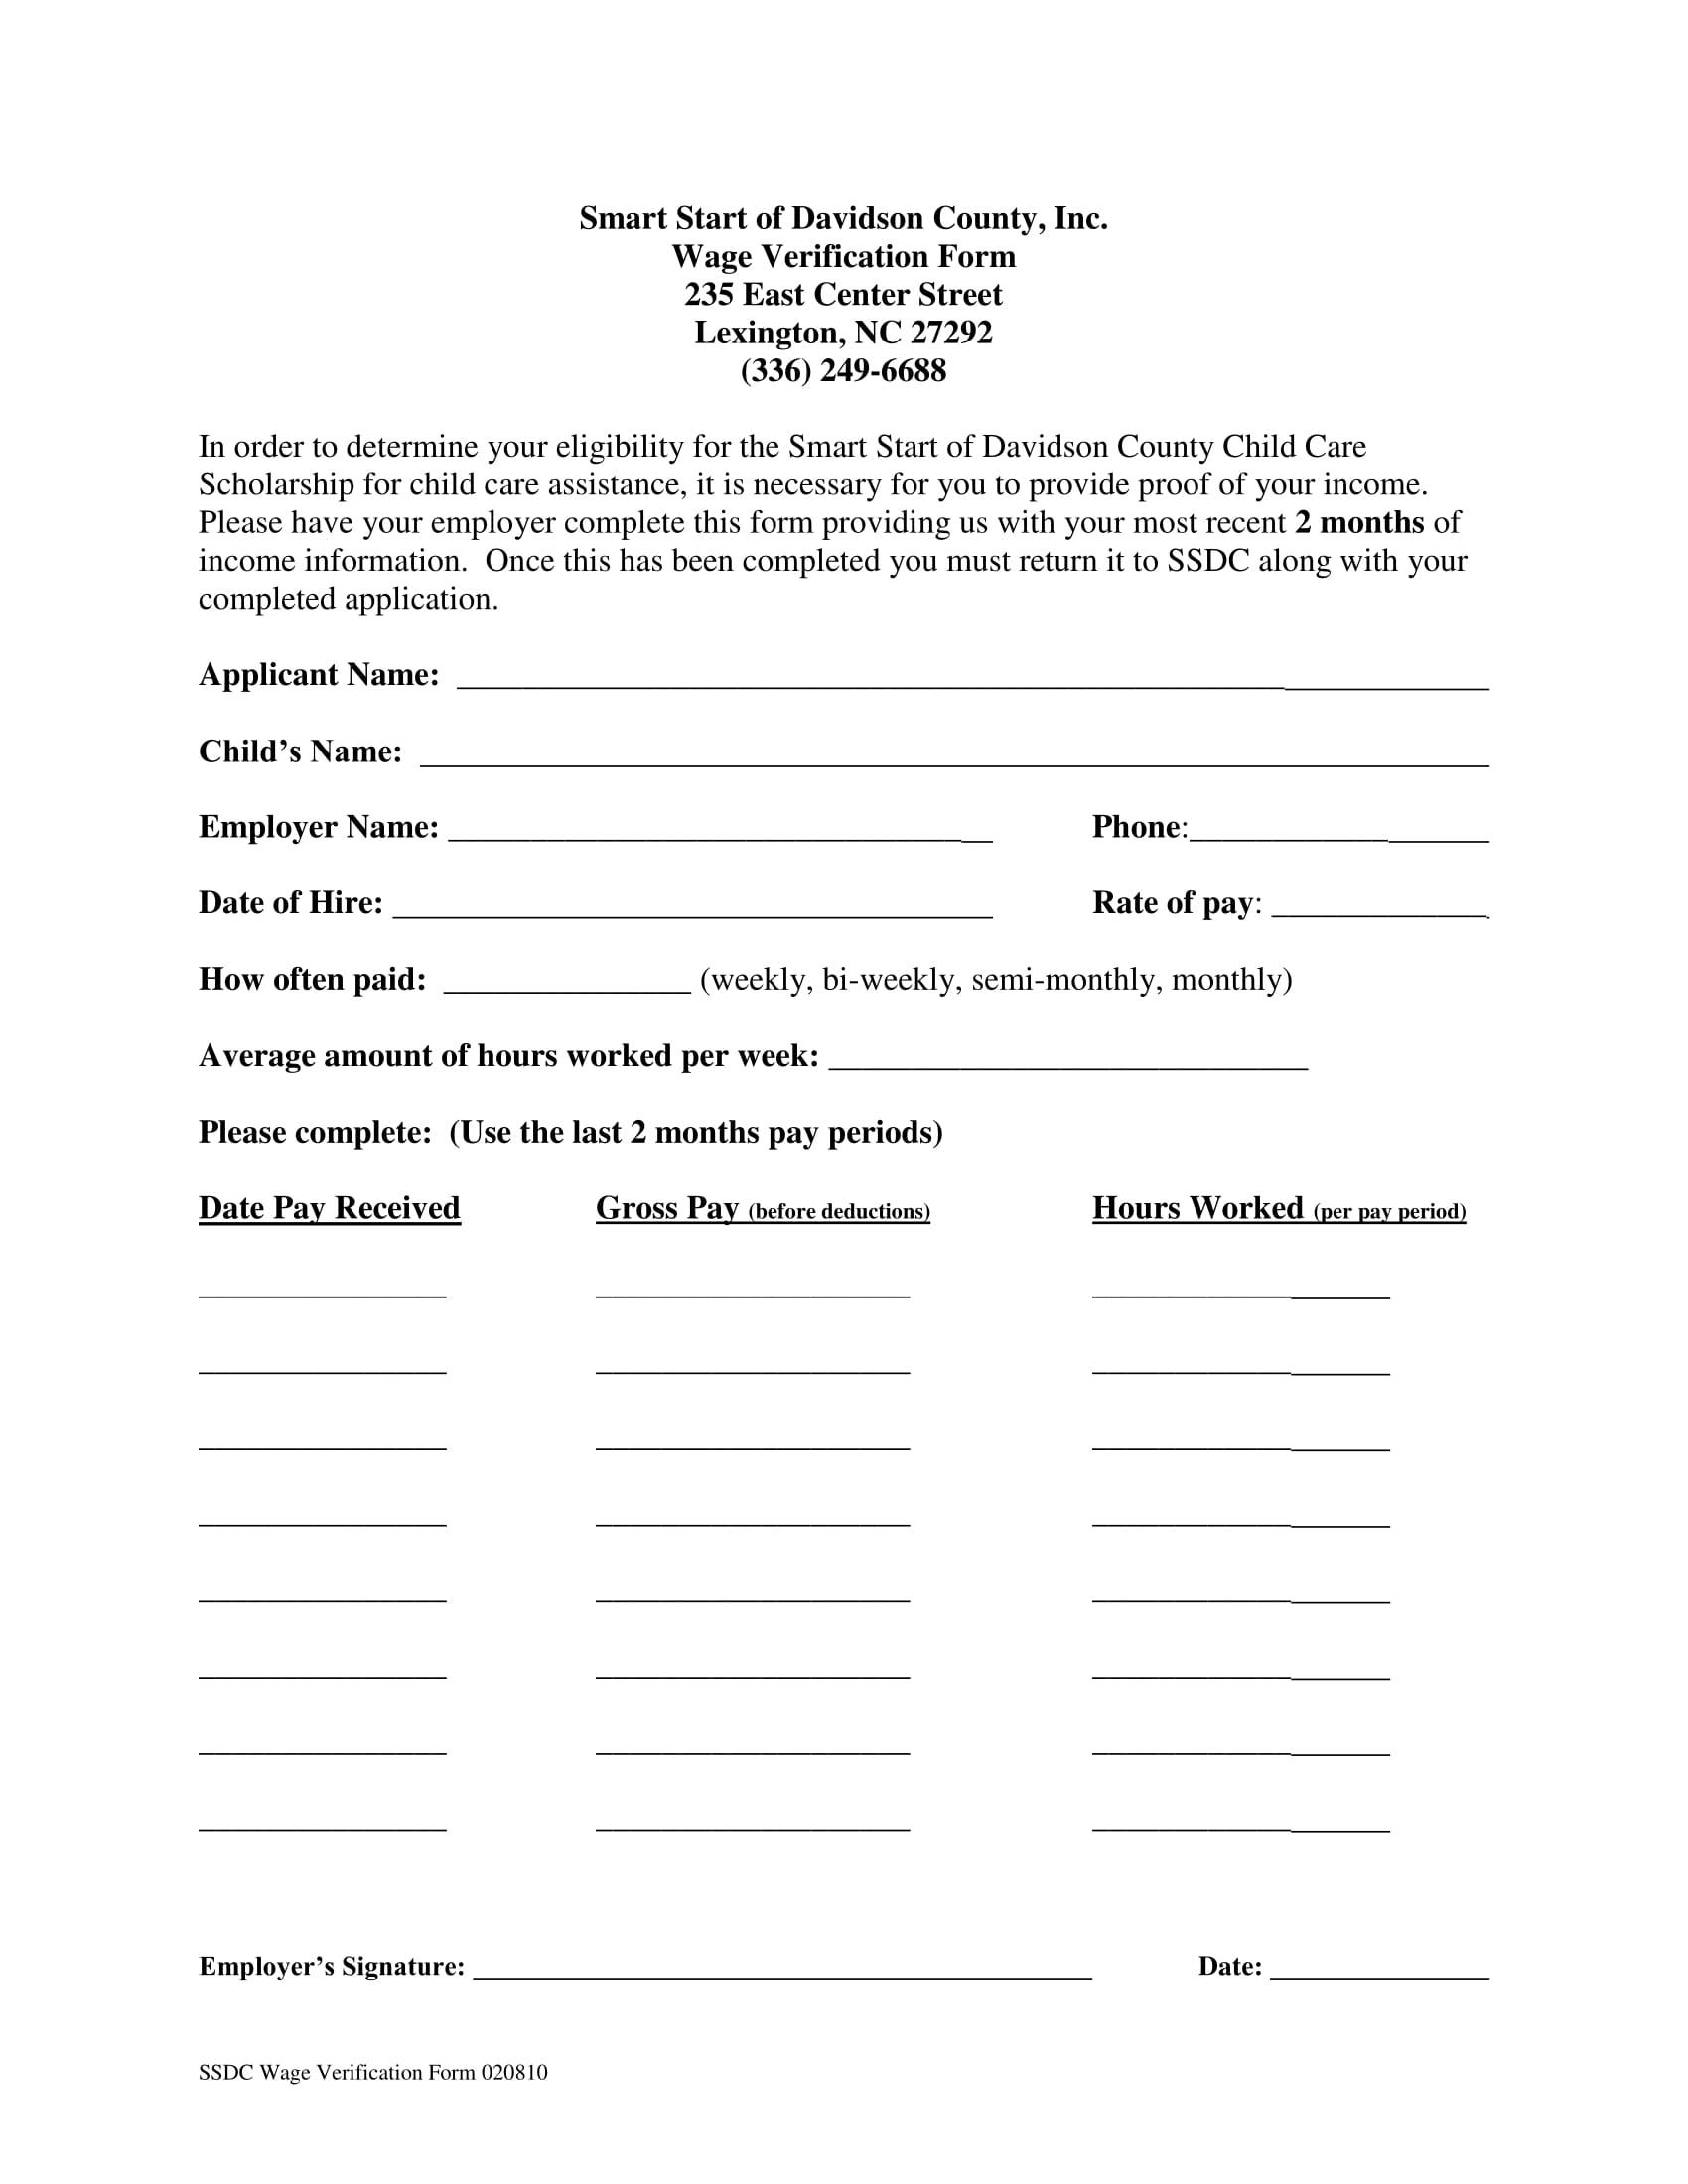 scholarship wage verification form 1